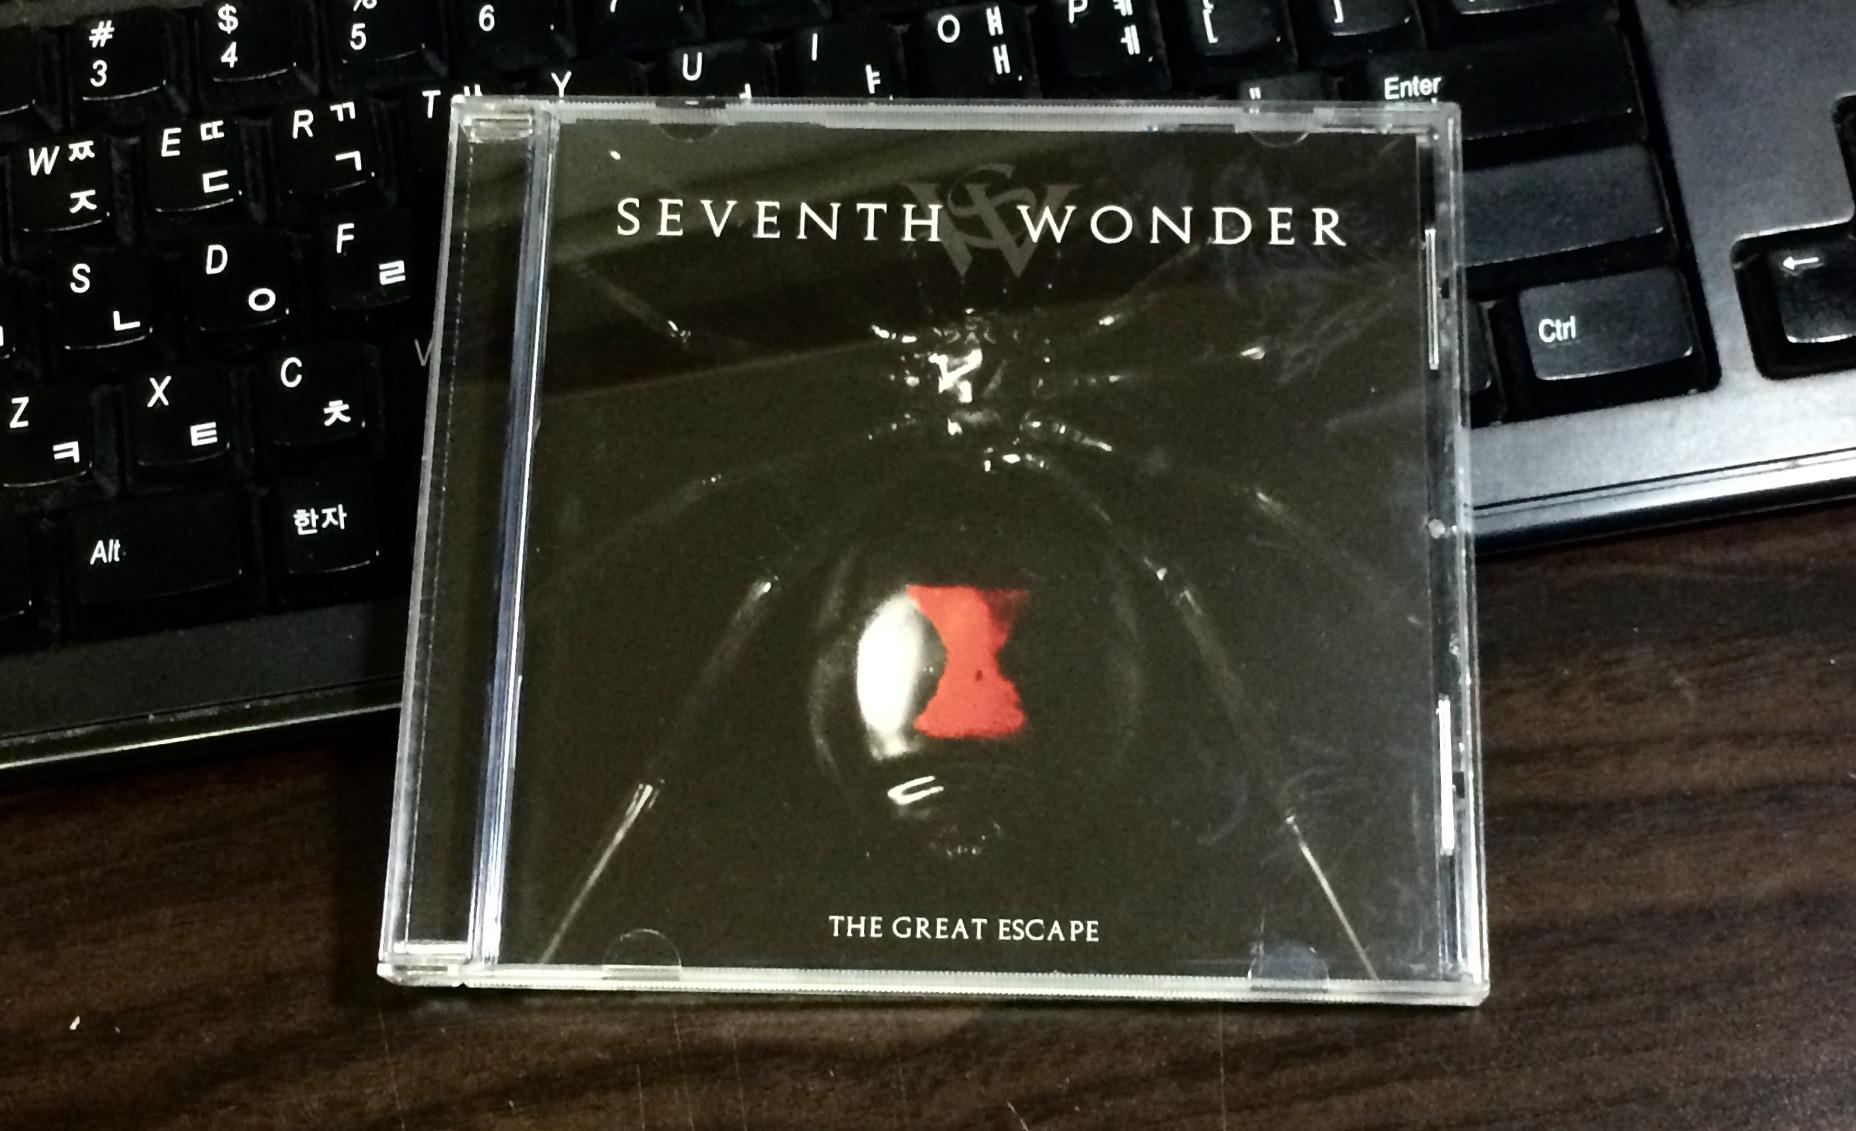 The Grate Escape - Seventh Wonder / 2010